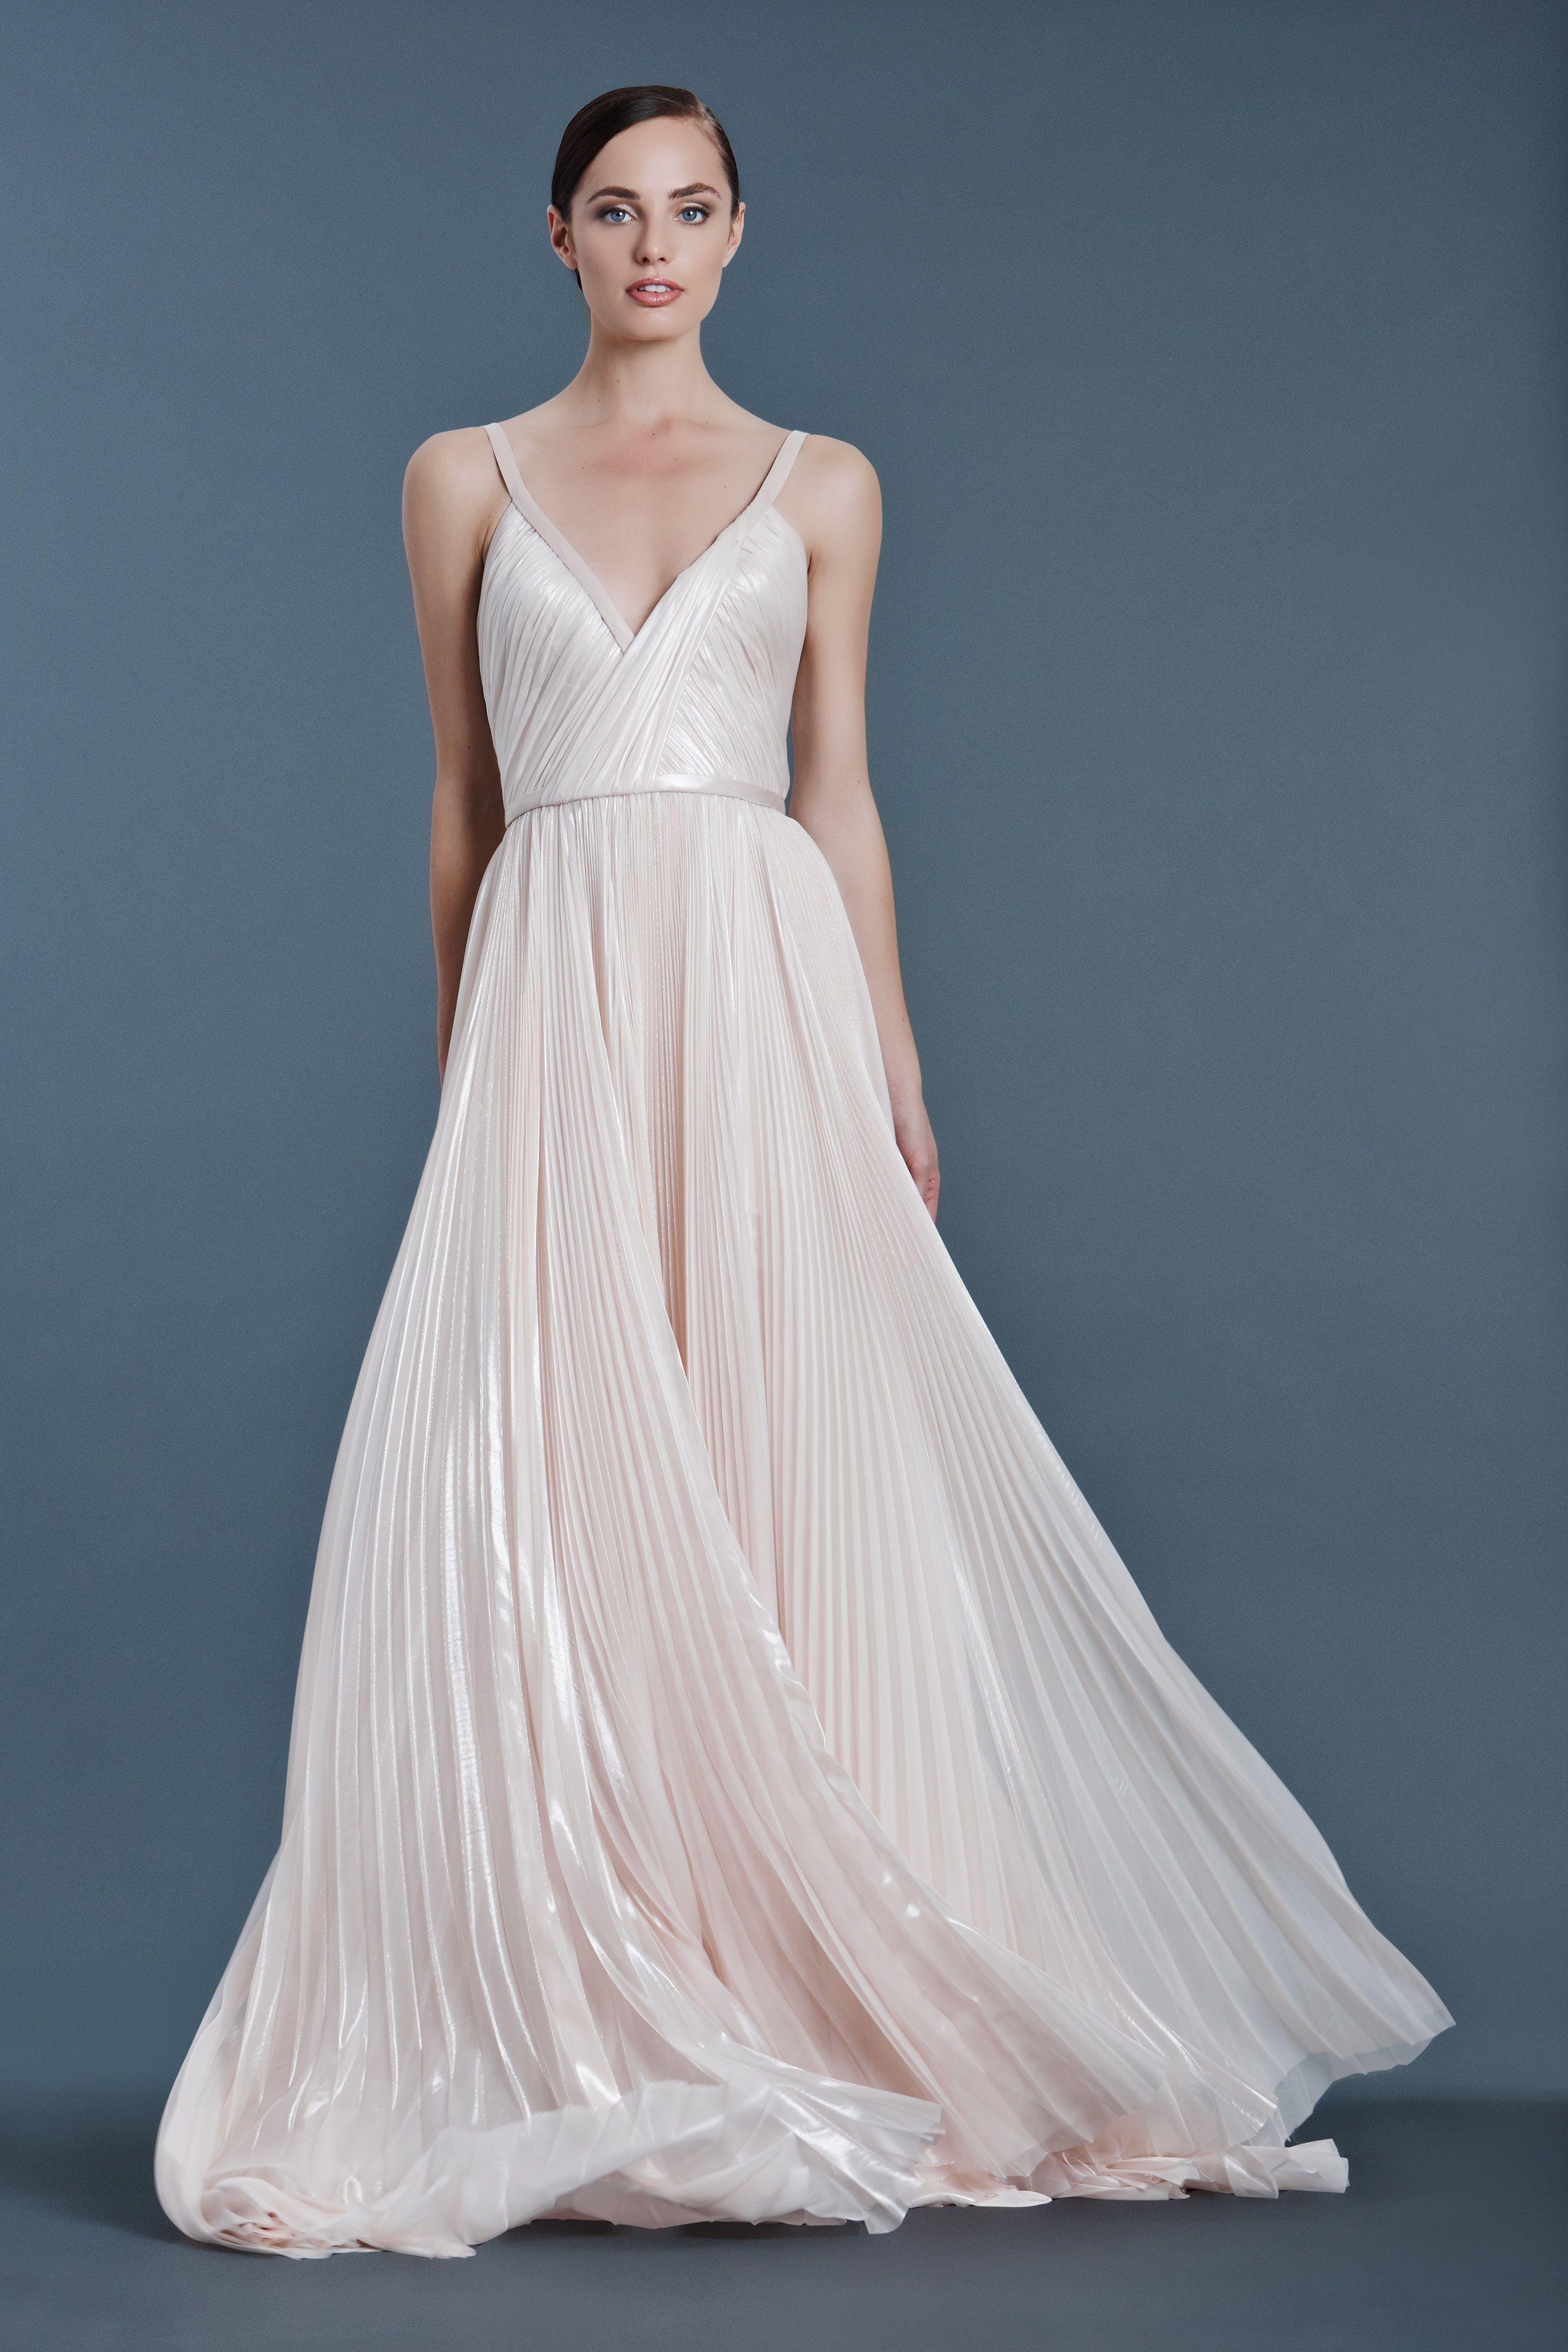 J Mendel Bridal Fall 2016 Fashion Show J Mendel Bridal Wedding Dresses Modern Wedding Dress